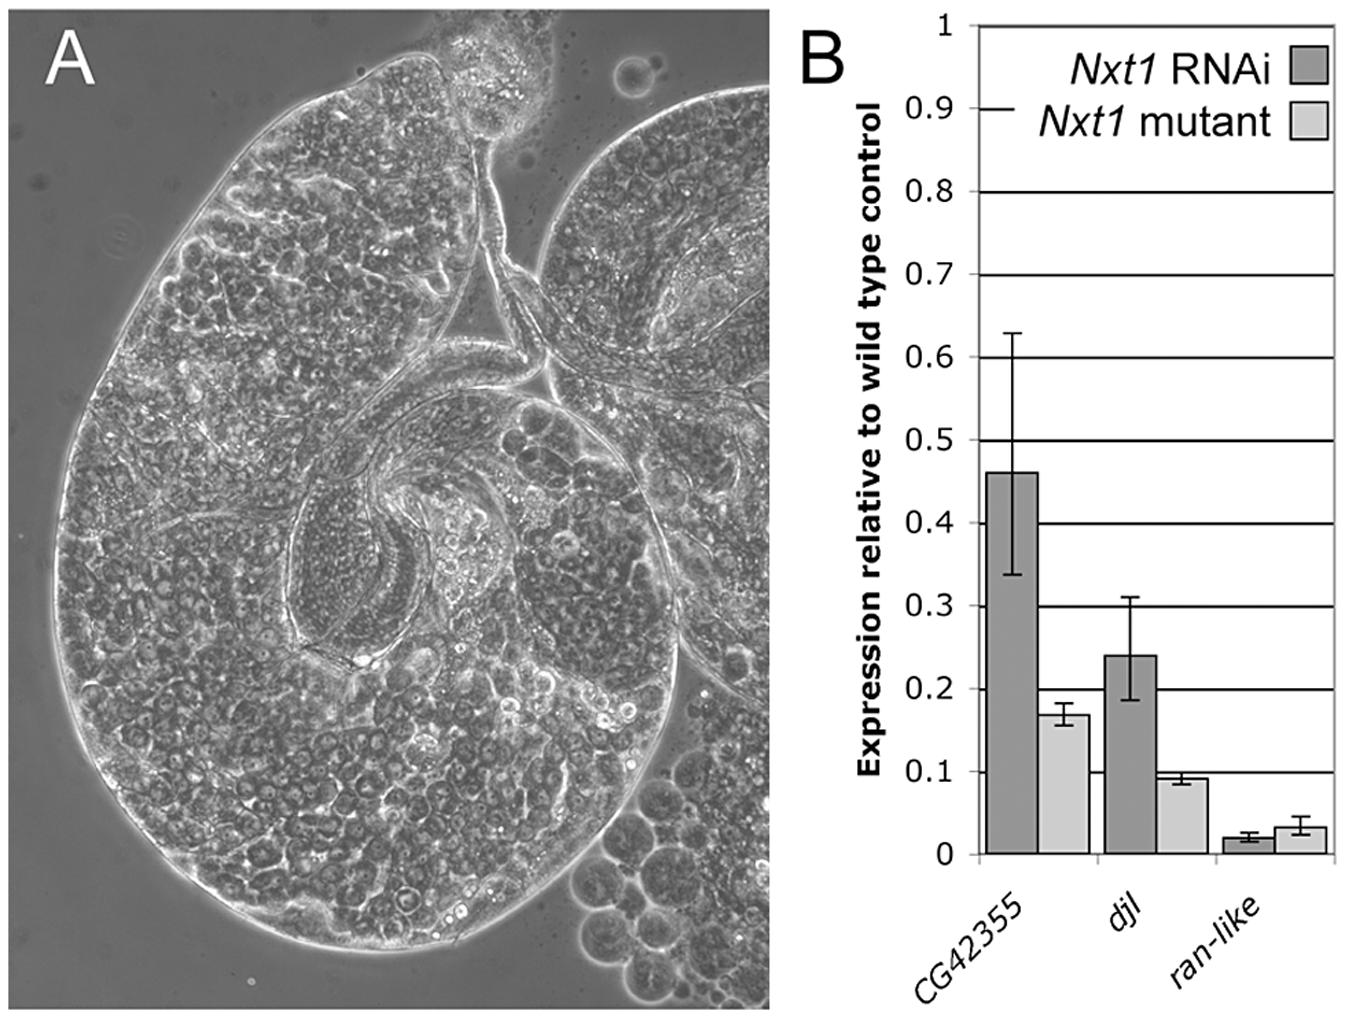 RNAi of <i>Nxt1</i> in spermatocytes phenocopies the <i>Nxt1<sup>z2-0488</sup></i> defect.